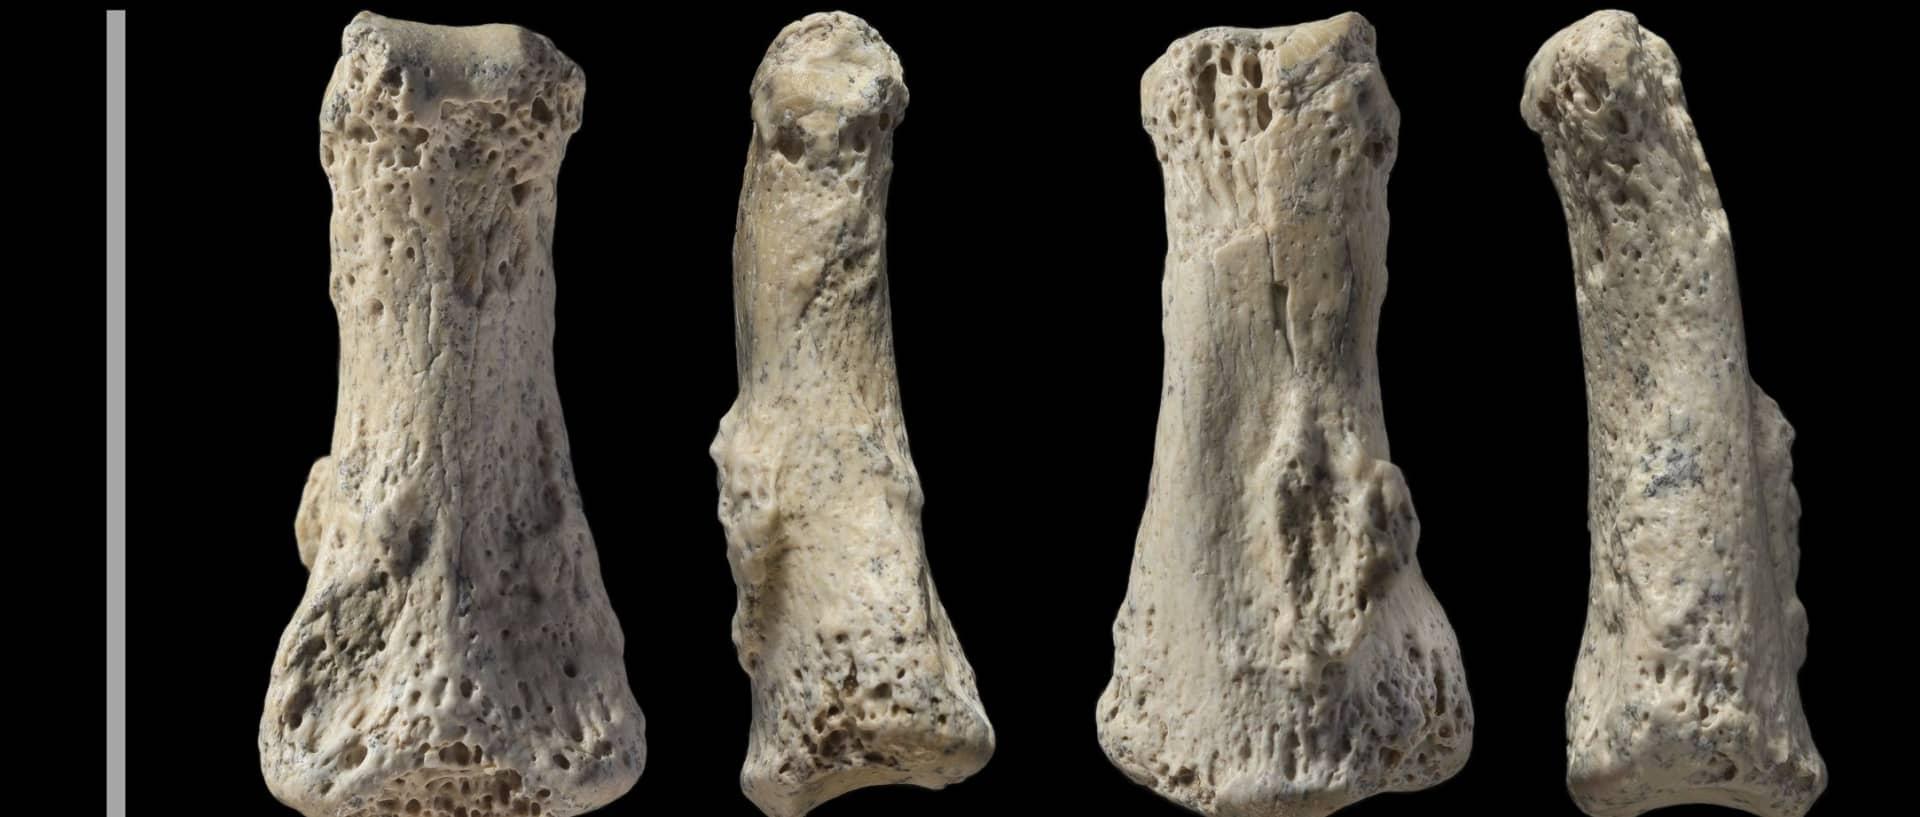 Antigo fóssil humano